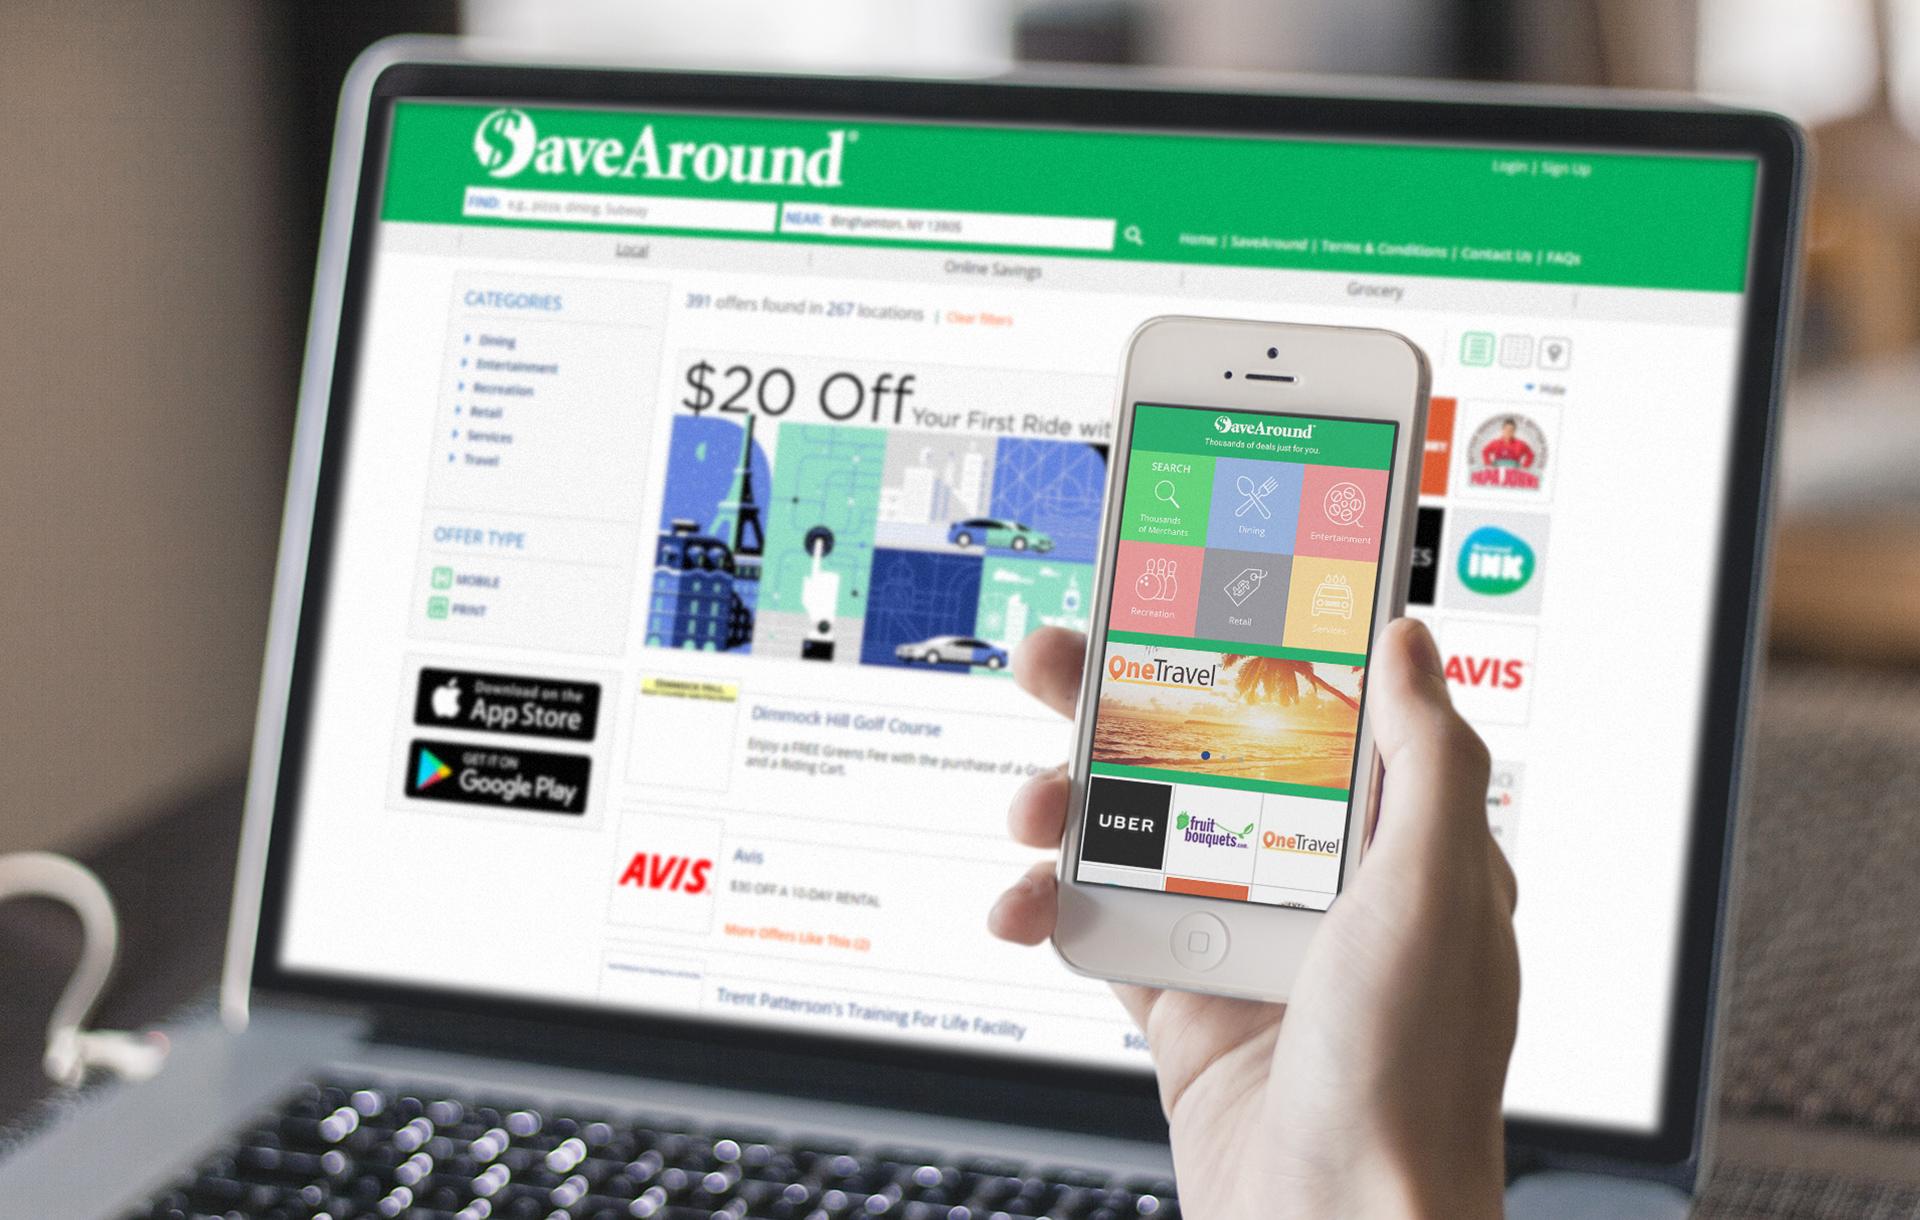 SaveAround-phone-and-laptop.jpg